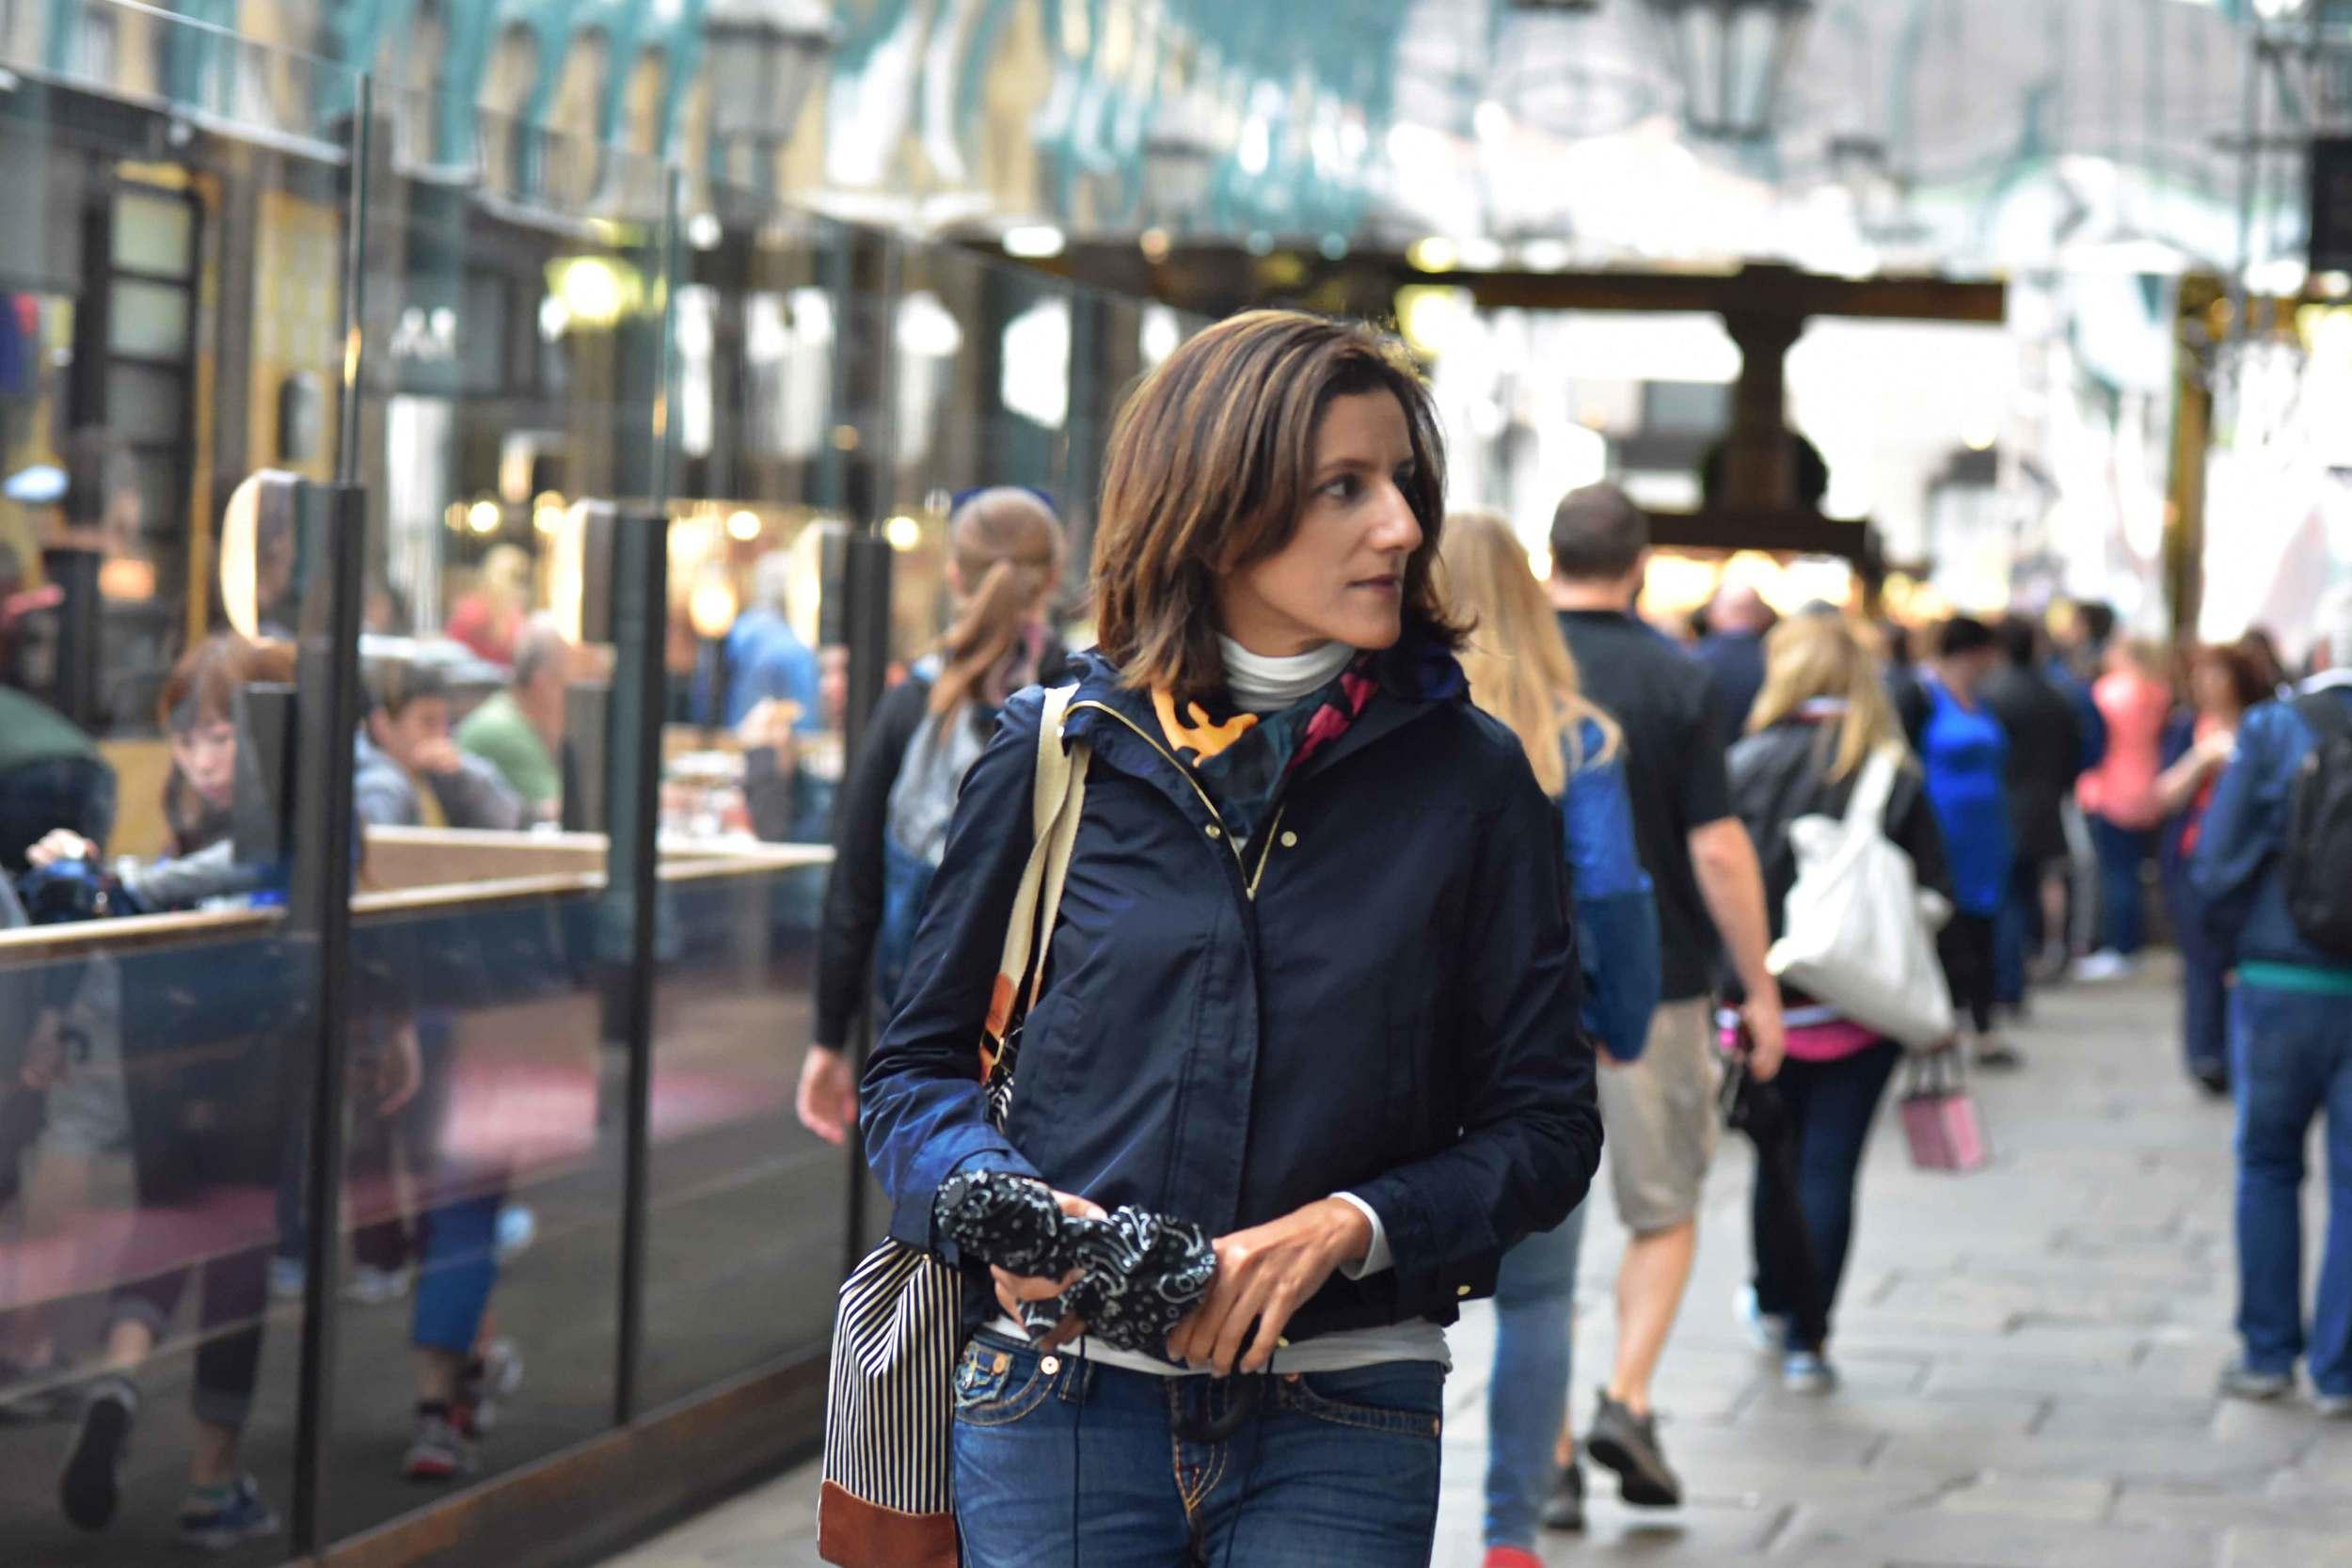 Zara water repellent jacket, Zara printed pocket square, Zara bandana print umbrella, True Religion jeans, Ralph Lauren polo sweater, Apple Market, Covent Garden, London, UK. Image©sourcingstyle.com